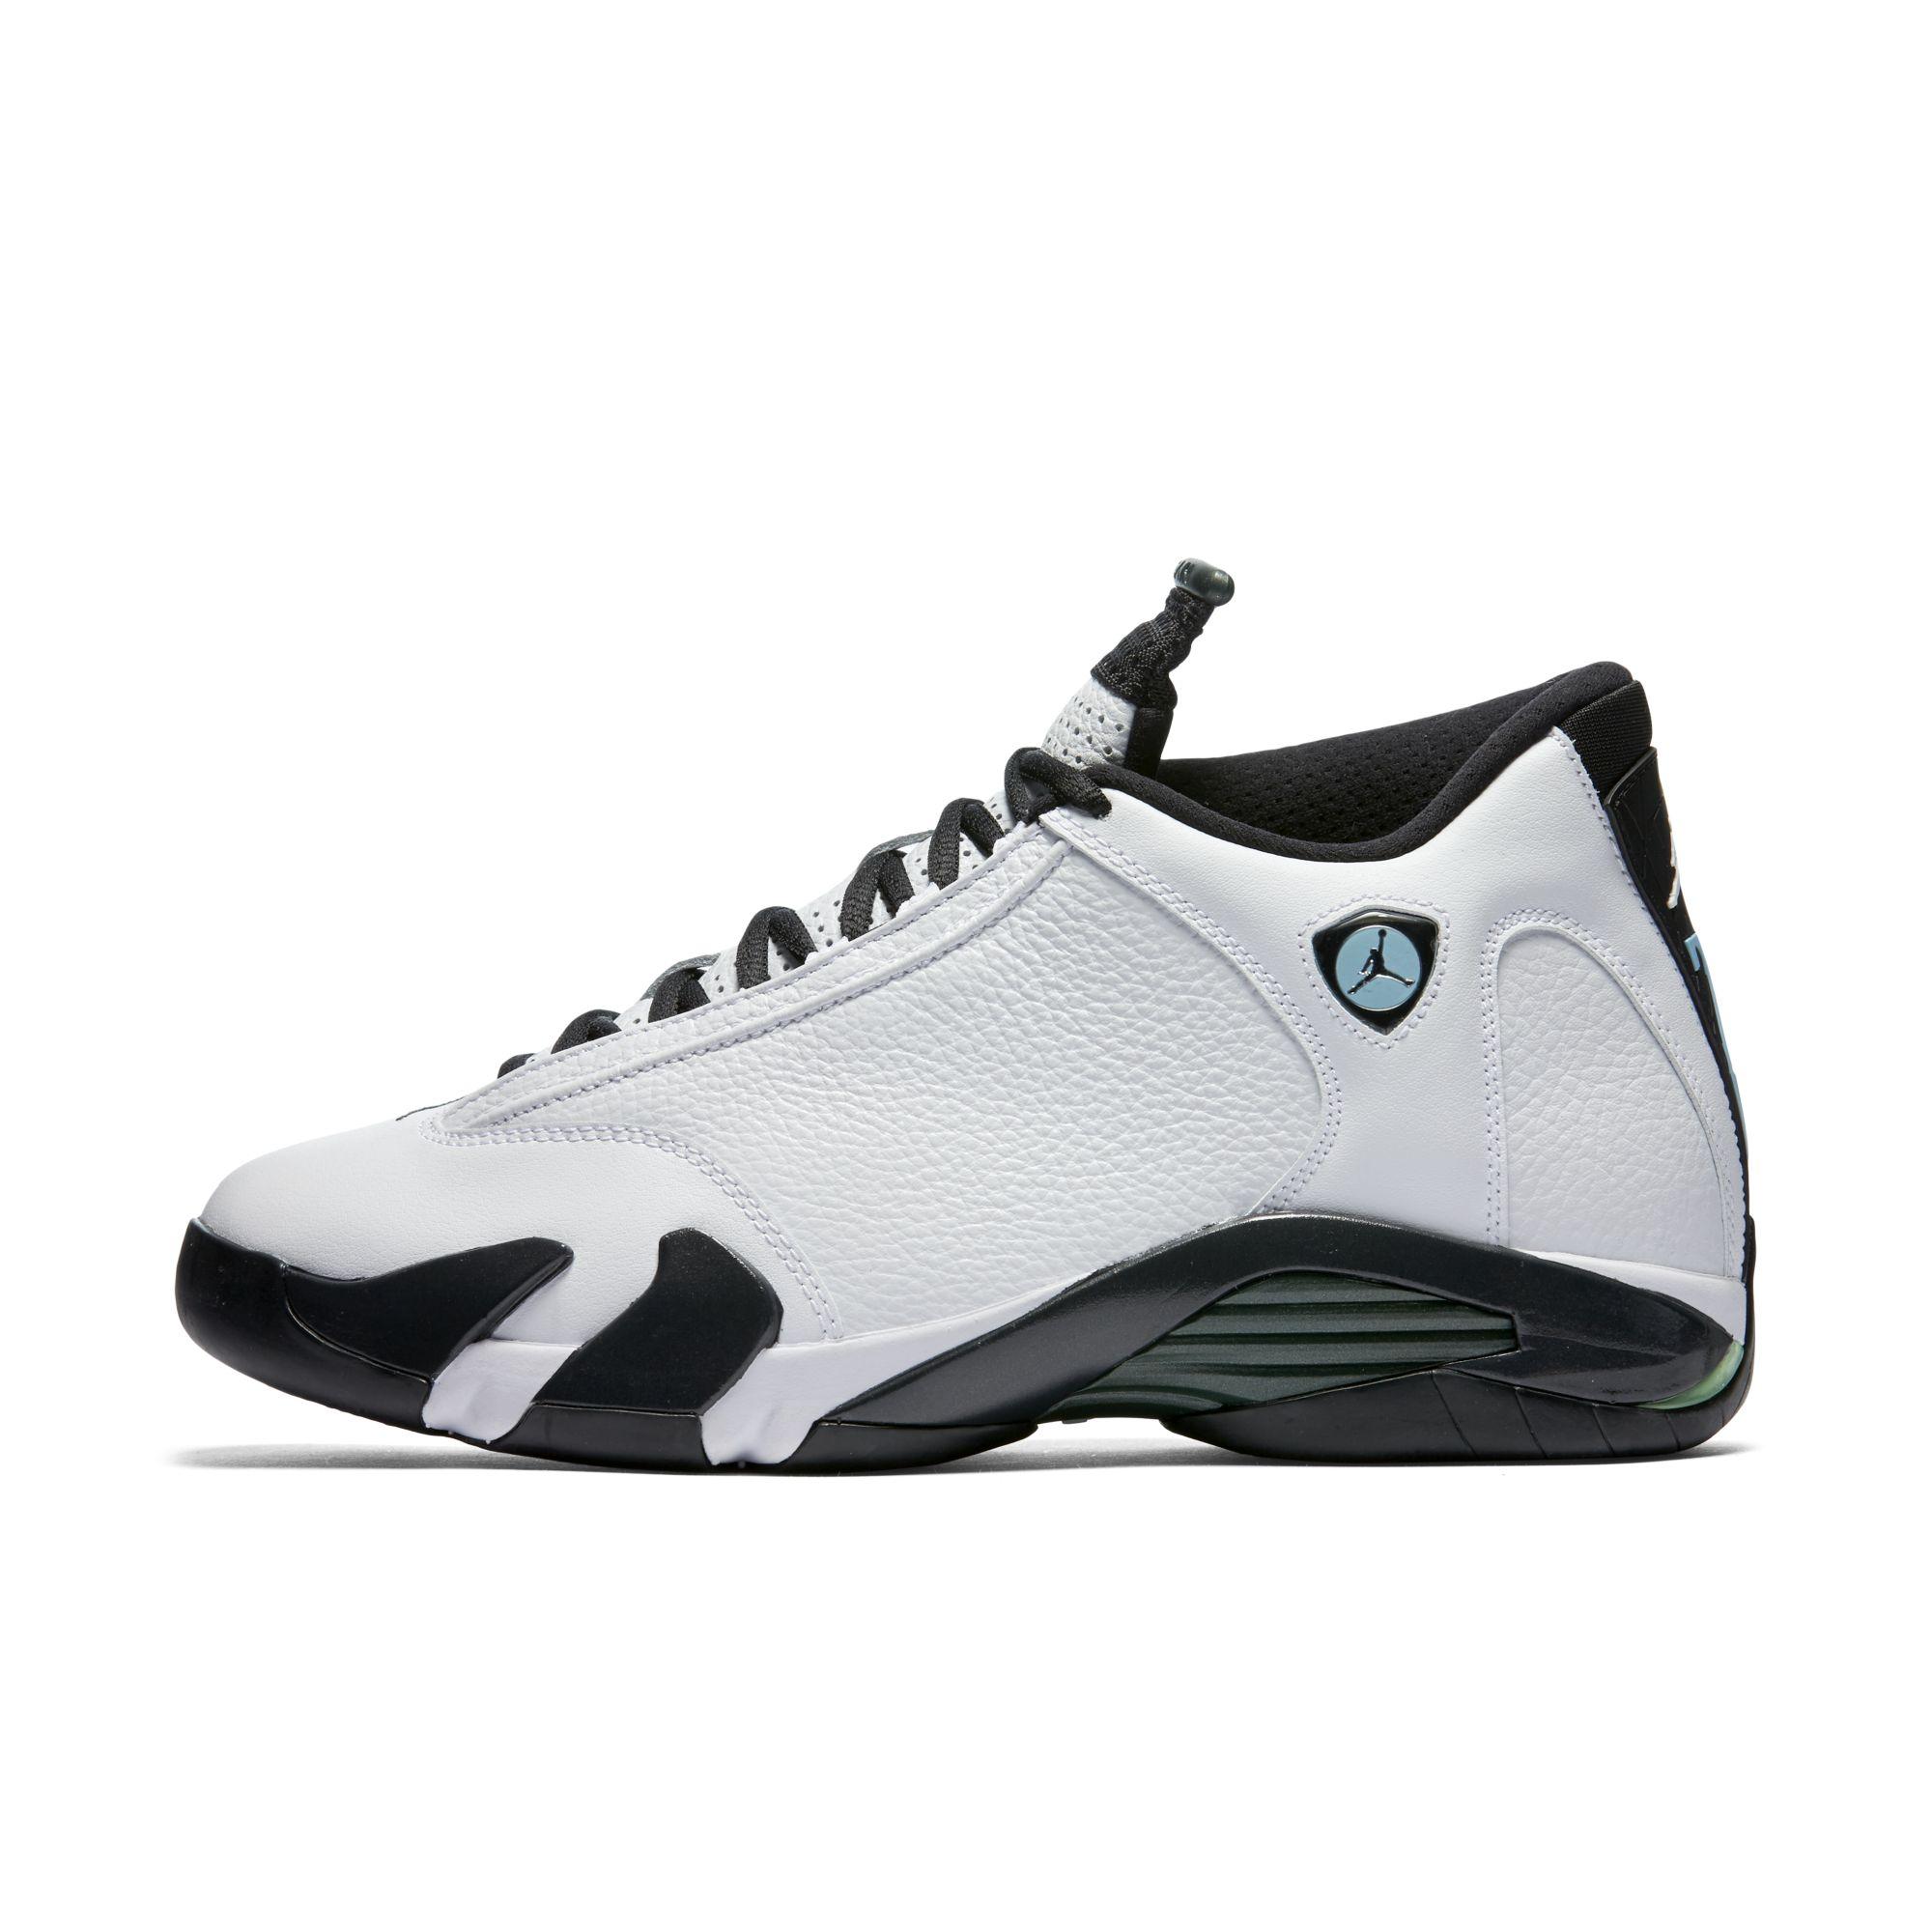 Official Look at the Air Jordan 14 Retro 'Oxidized Green